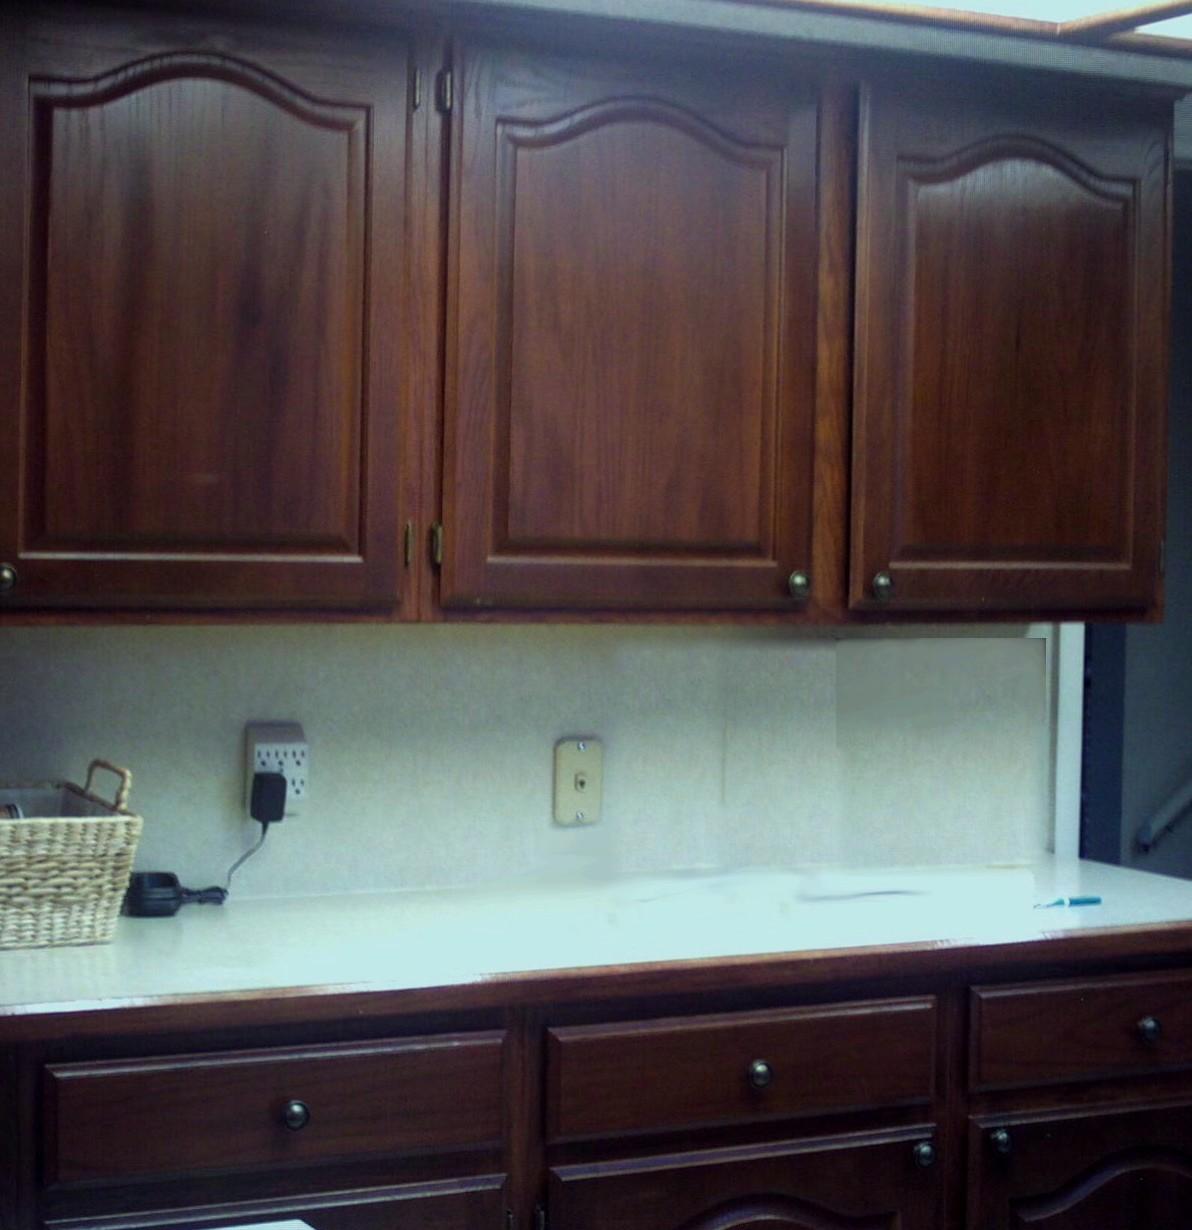 dark cabinet refinishing dark kitchen cabinets Kitchen cabinets and cupboards refinished in cherry wood color